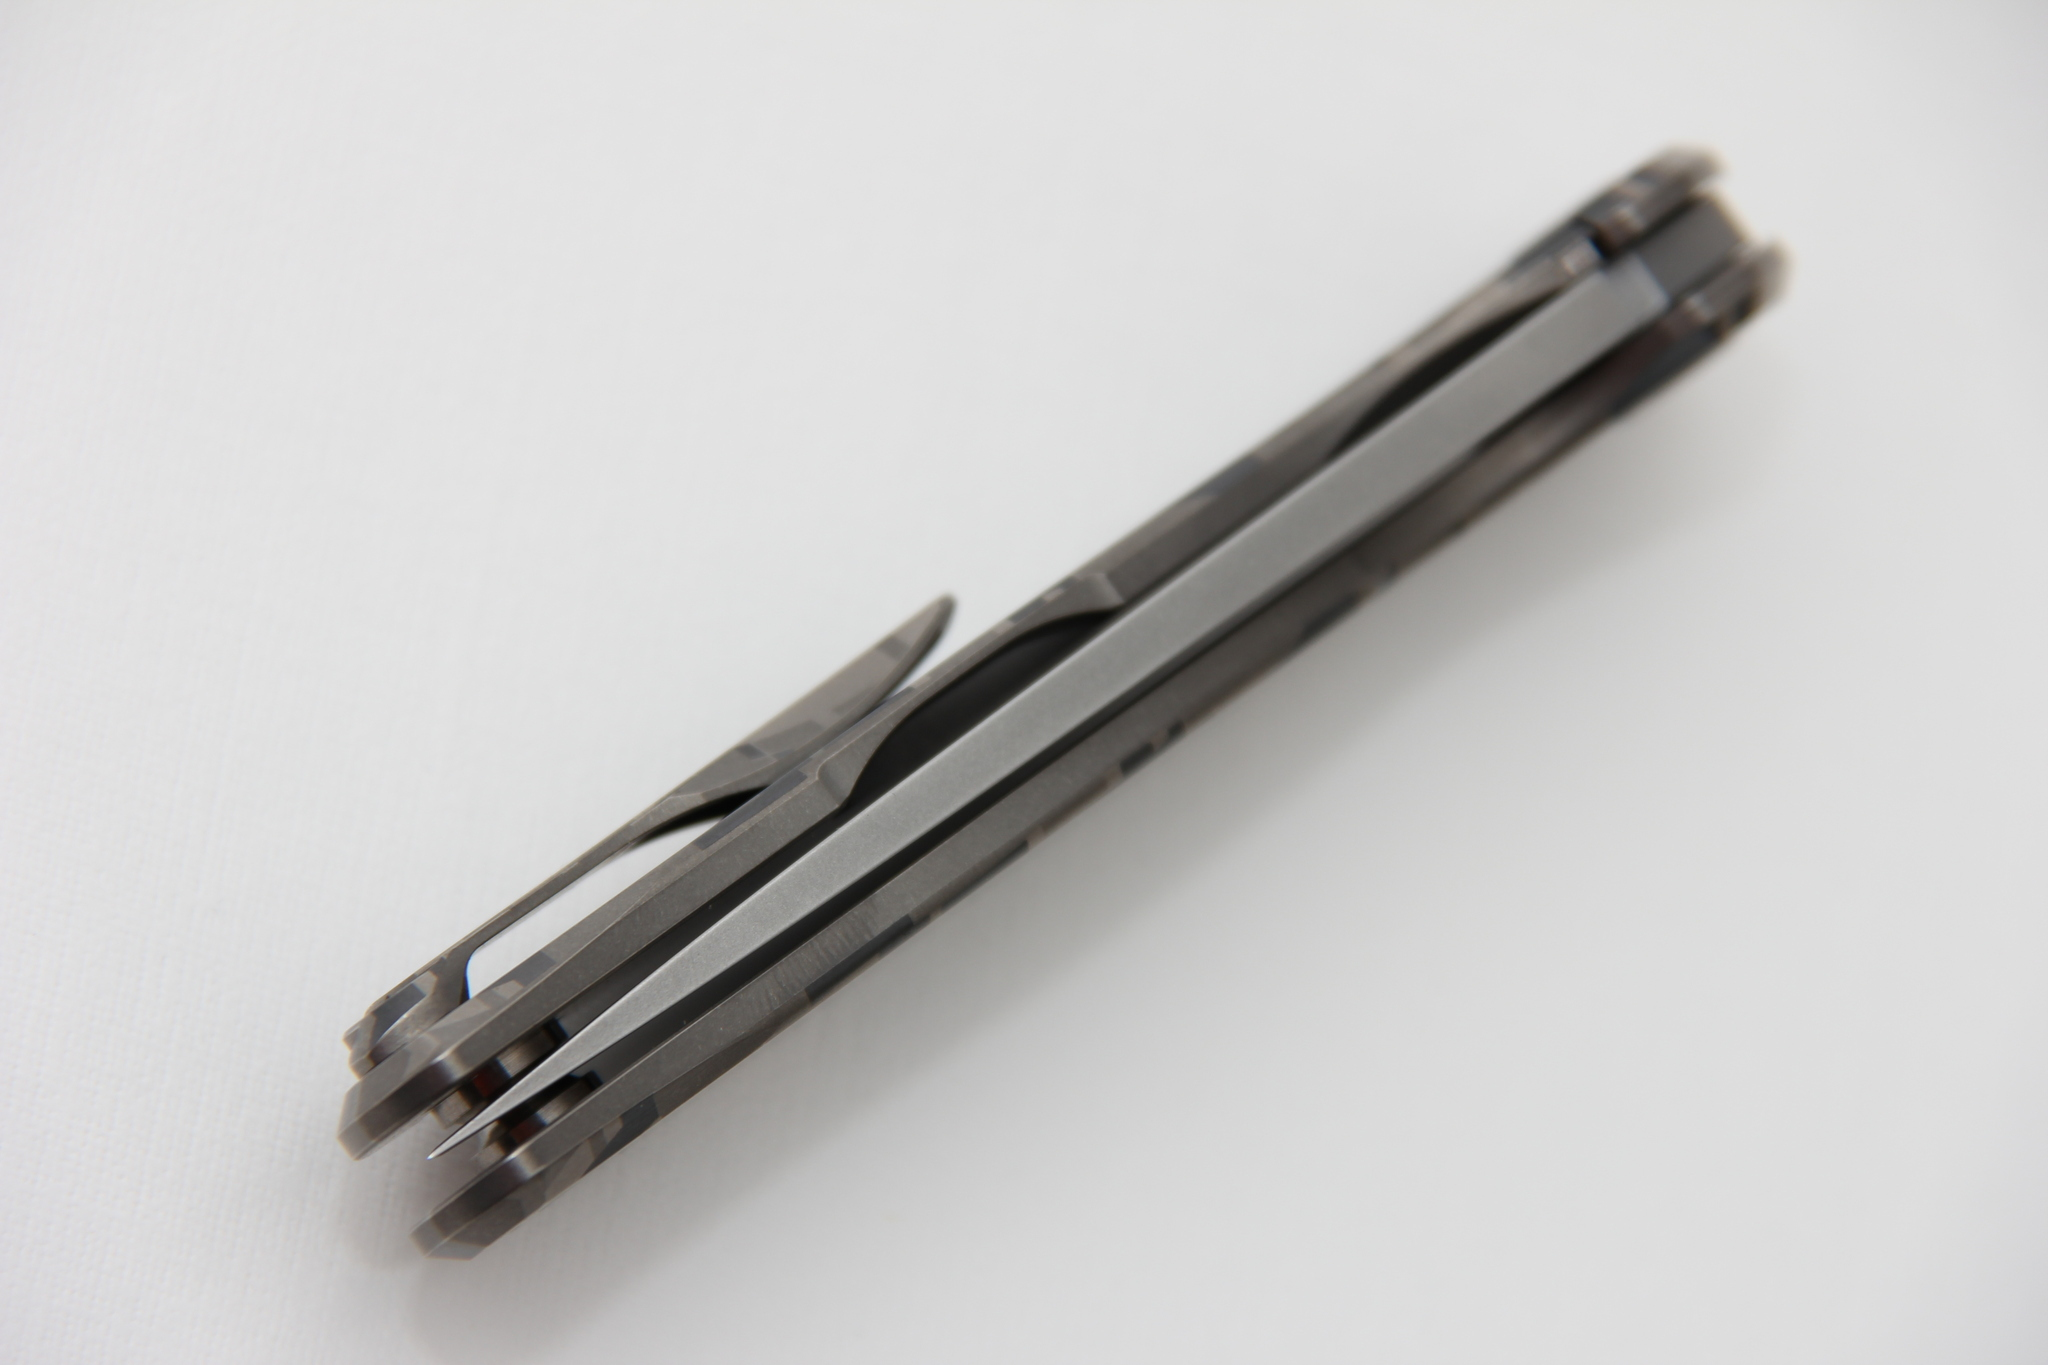 Нож Широгоров Flipper 95 Elmax Custom Division - фотография